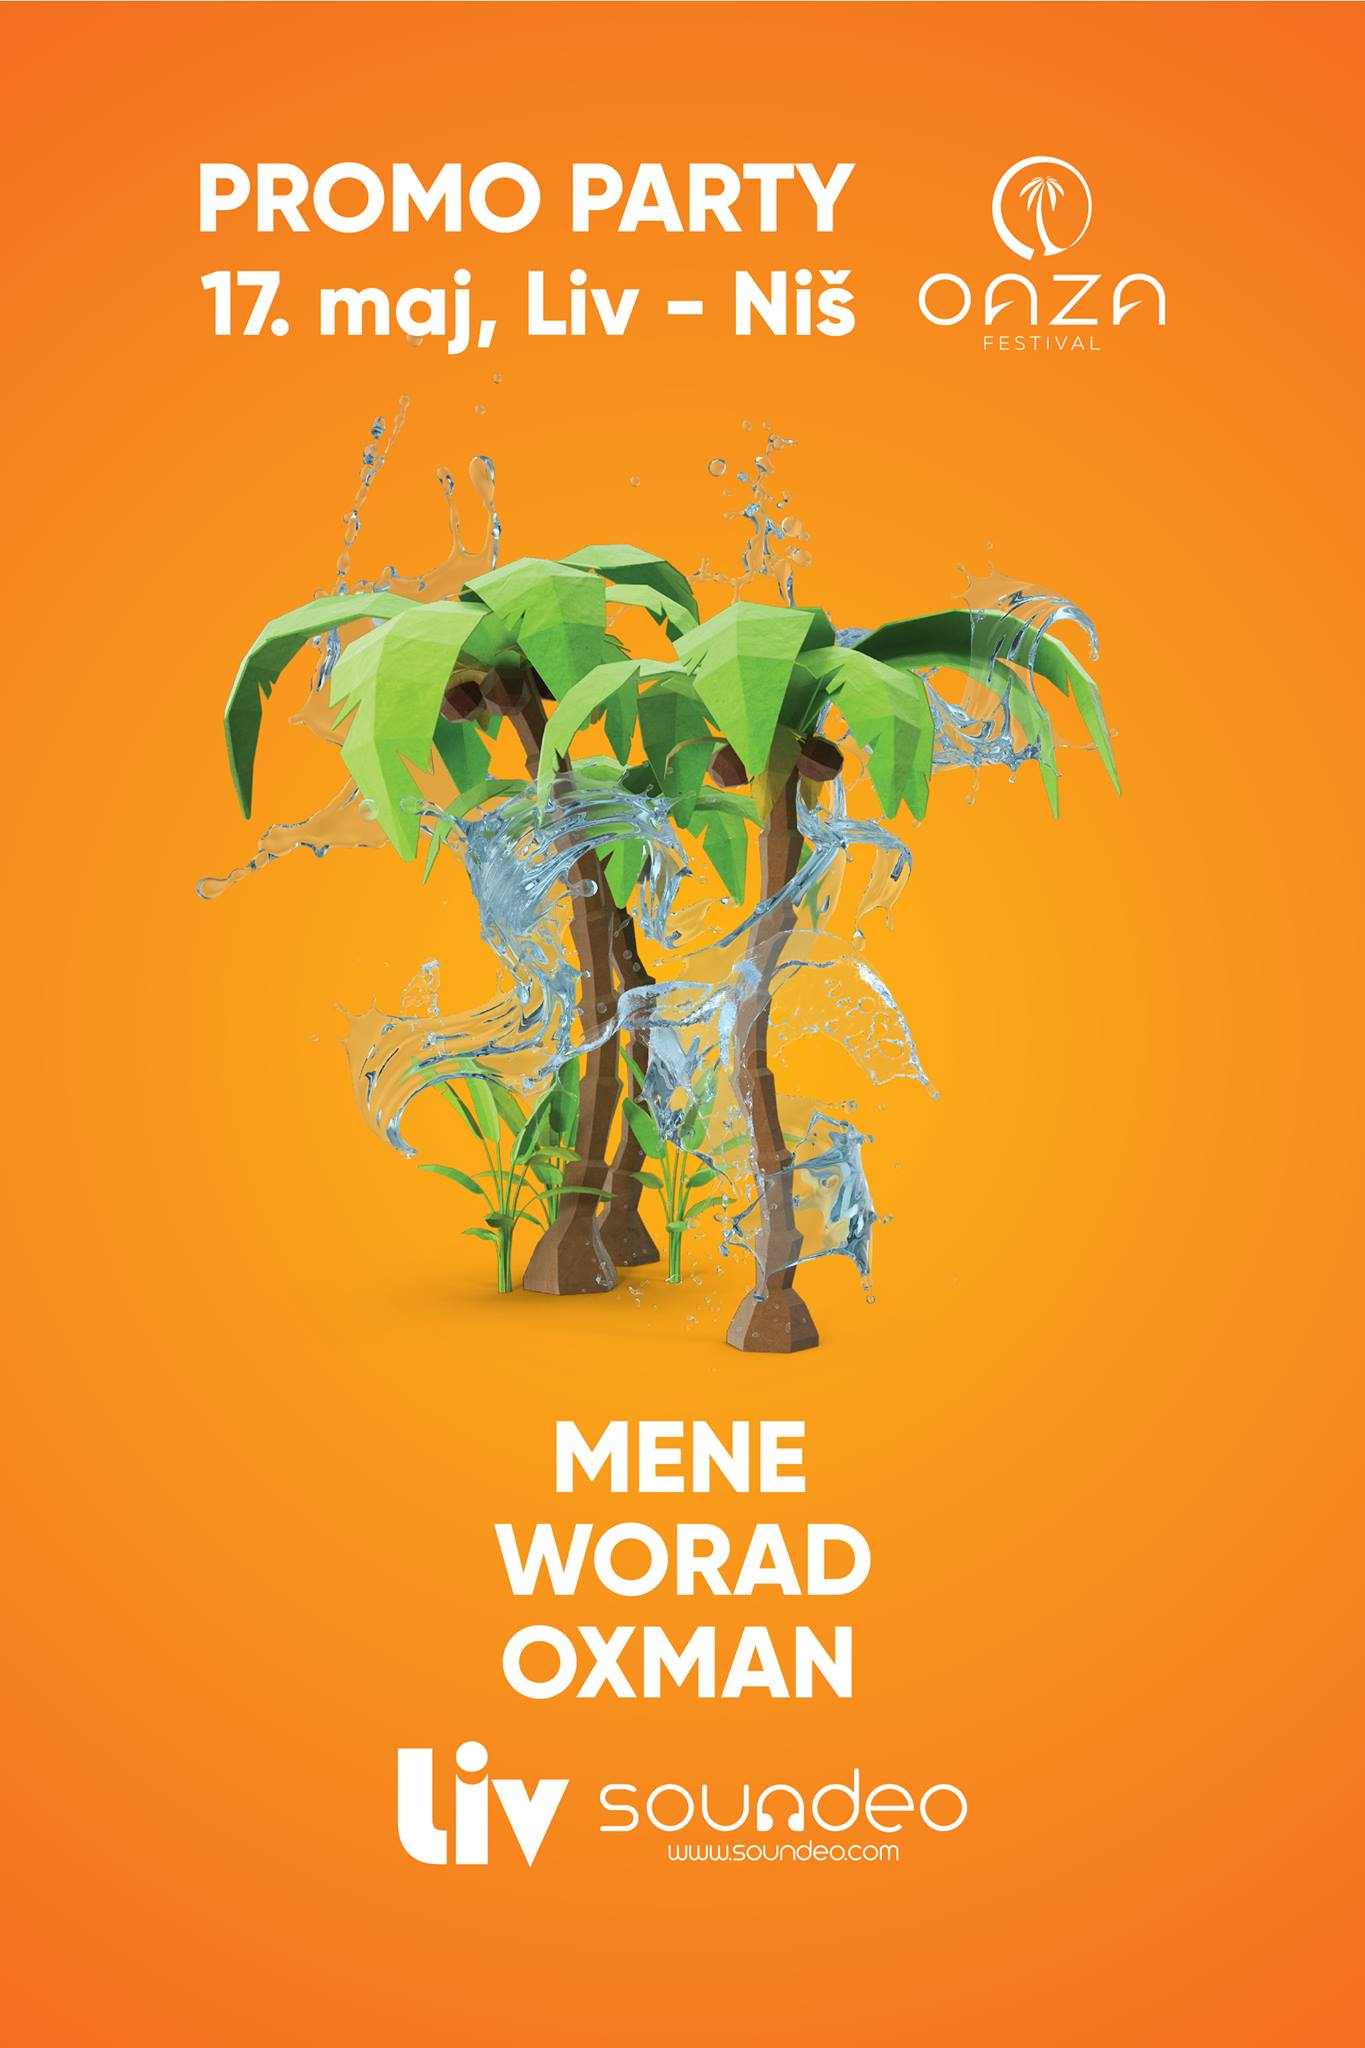 Promo Party w/ Mene, Worad, Oxman @ Liv